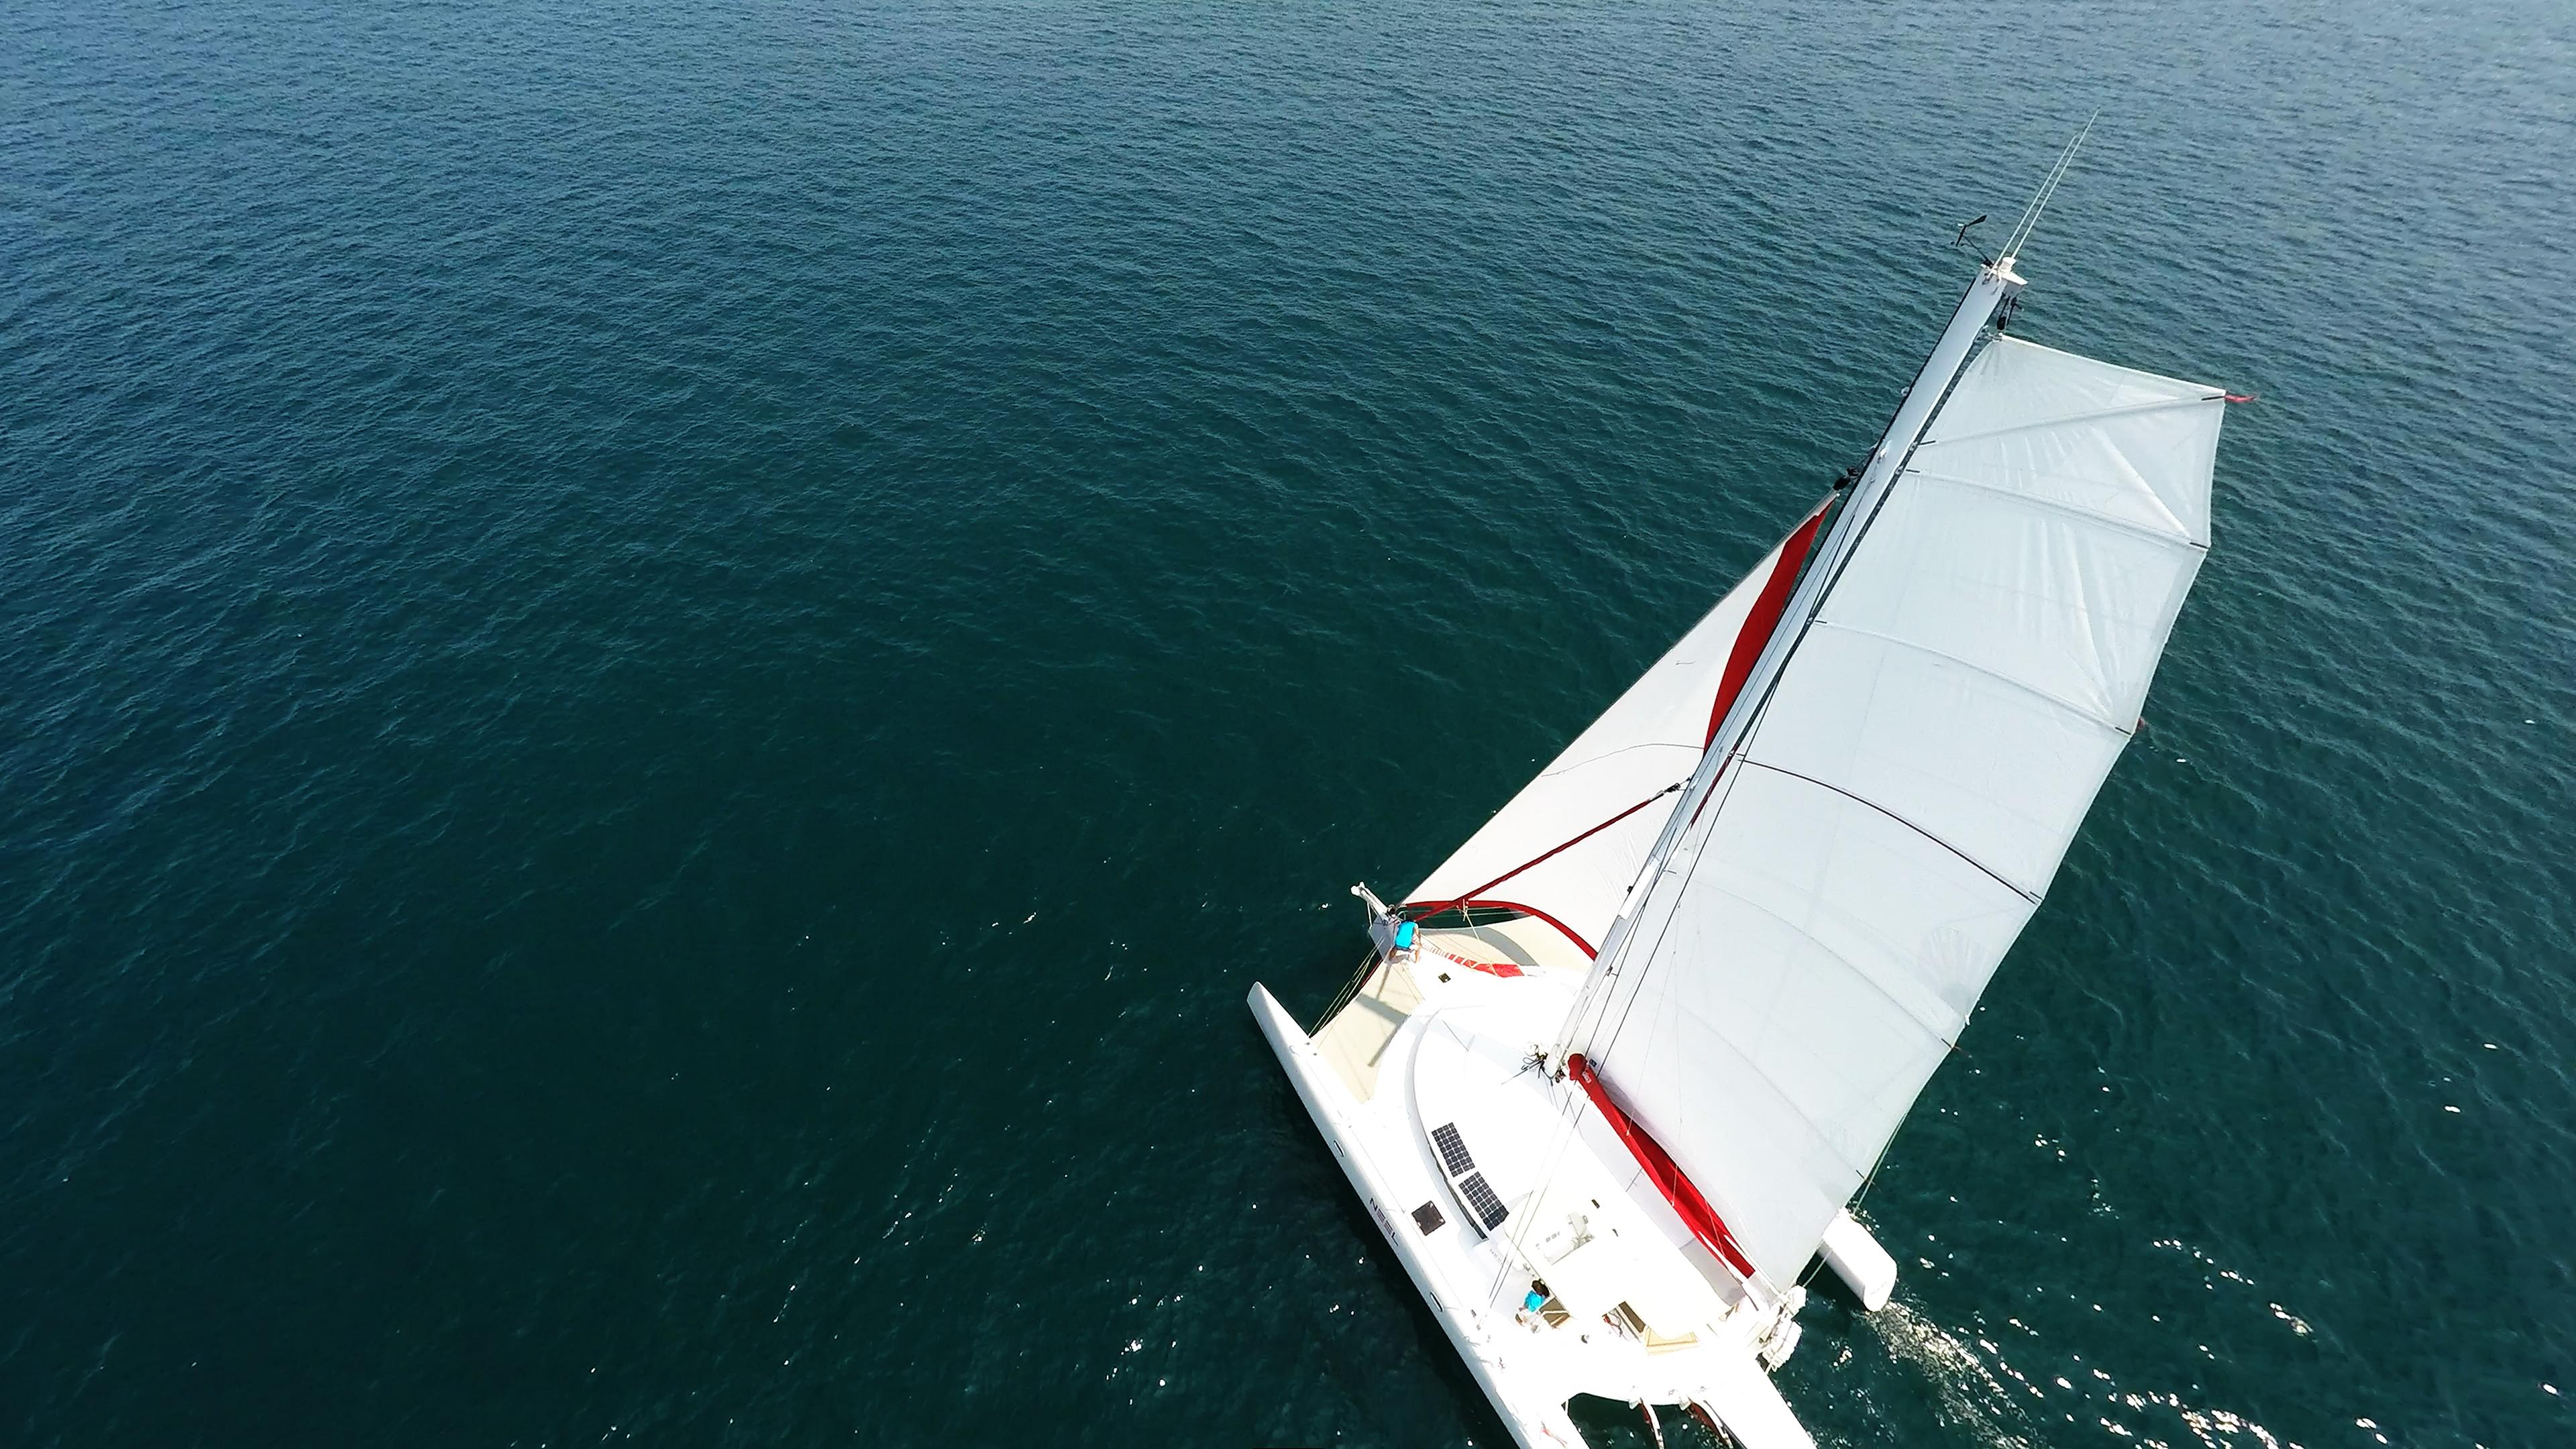 trimaran bird view mast flatten main sail sailing